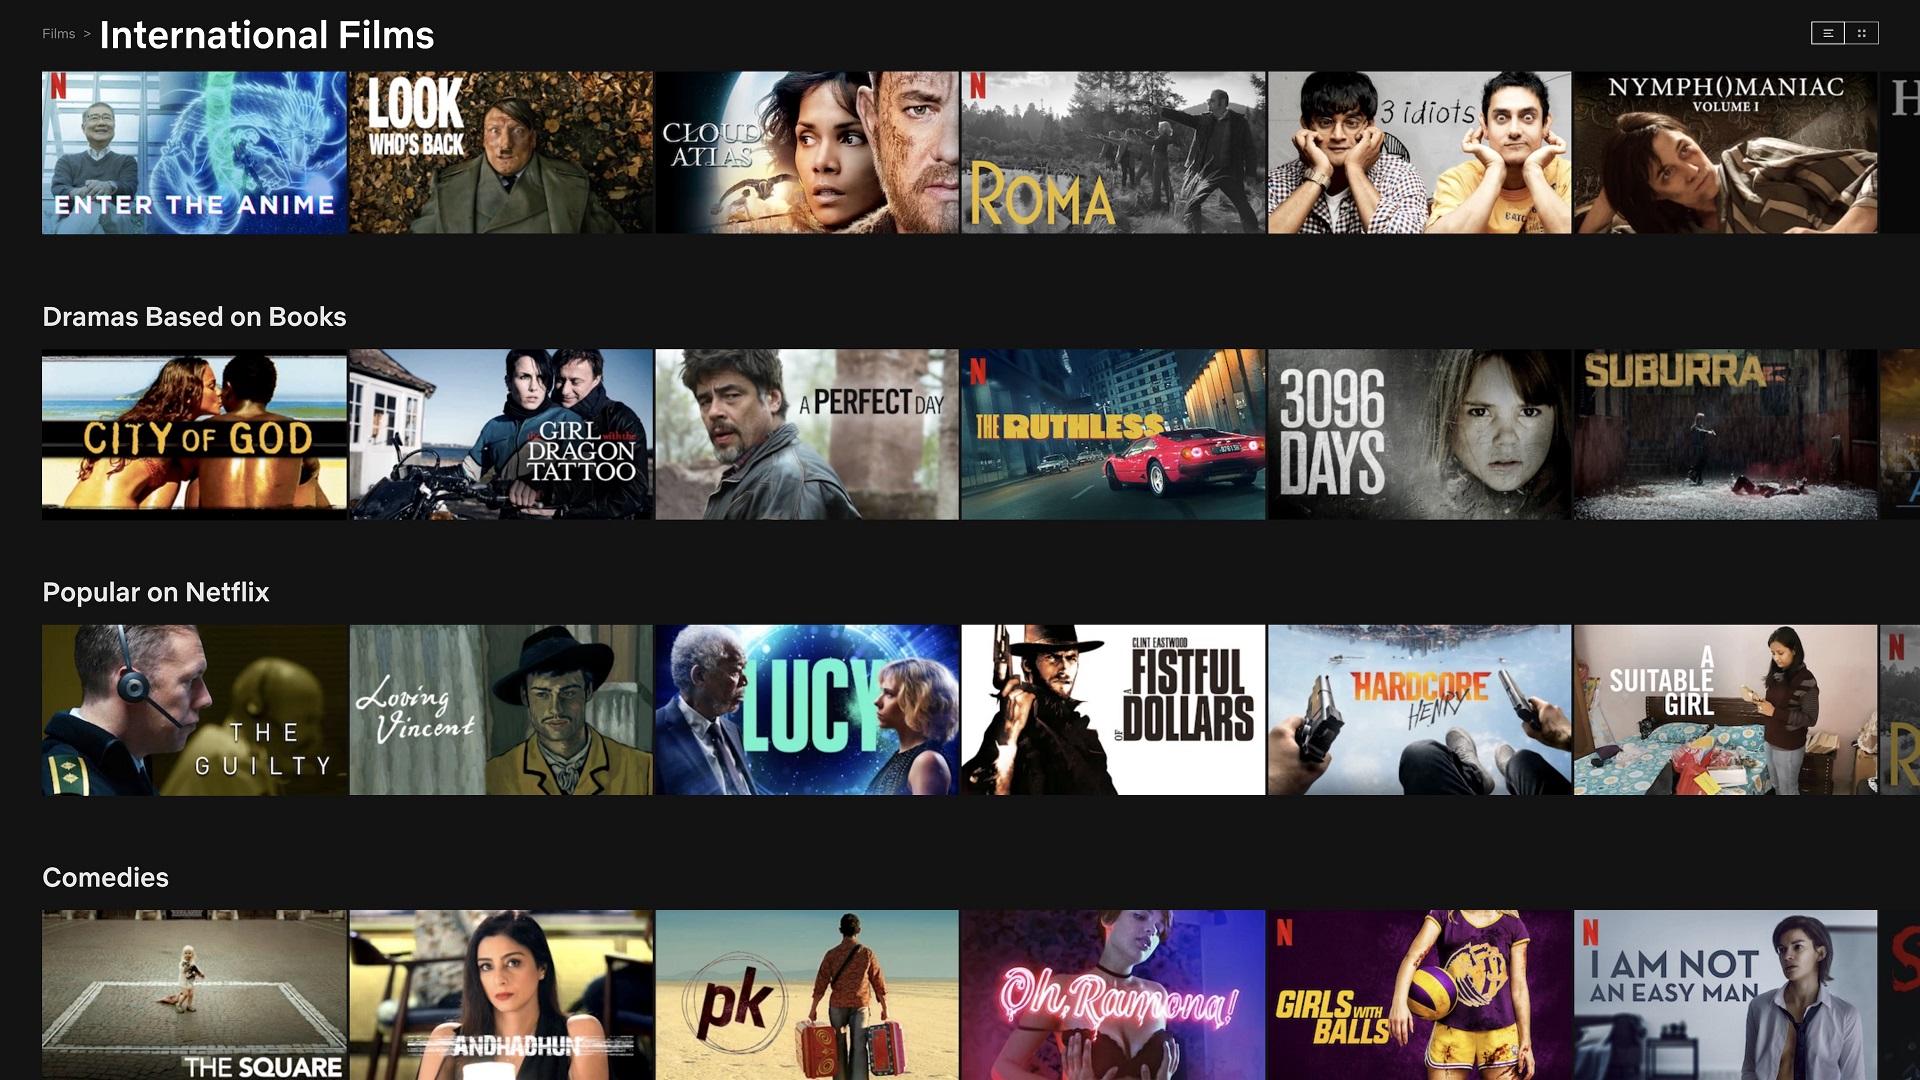 Best foreign films on Netflix featured